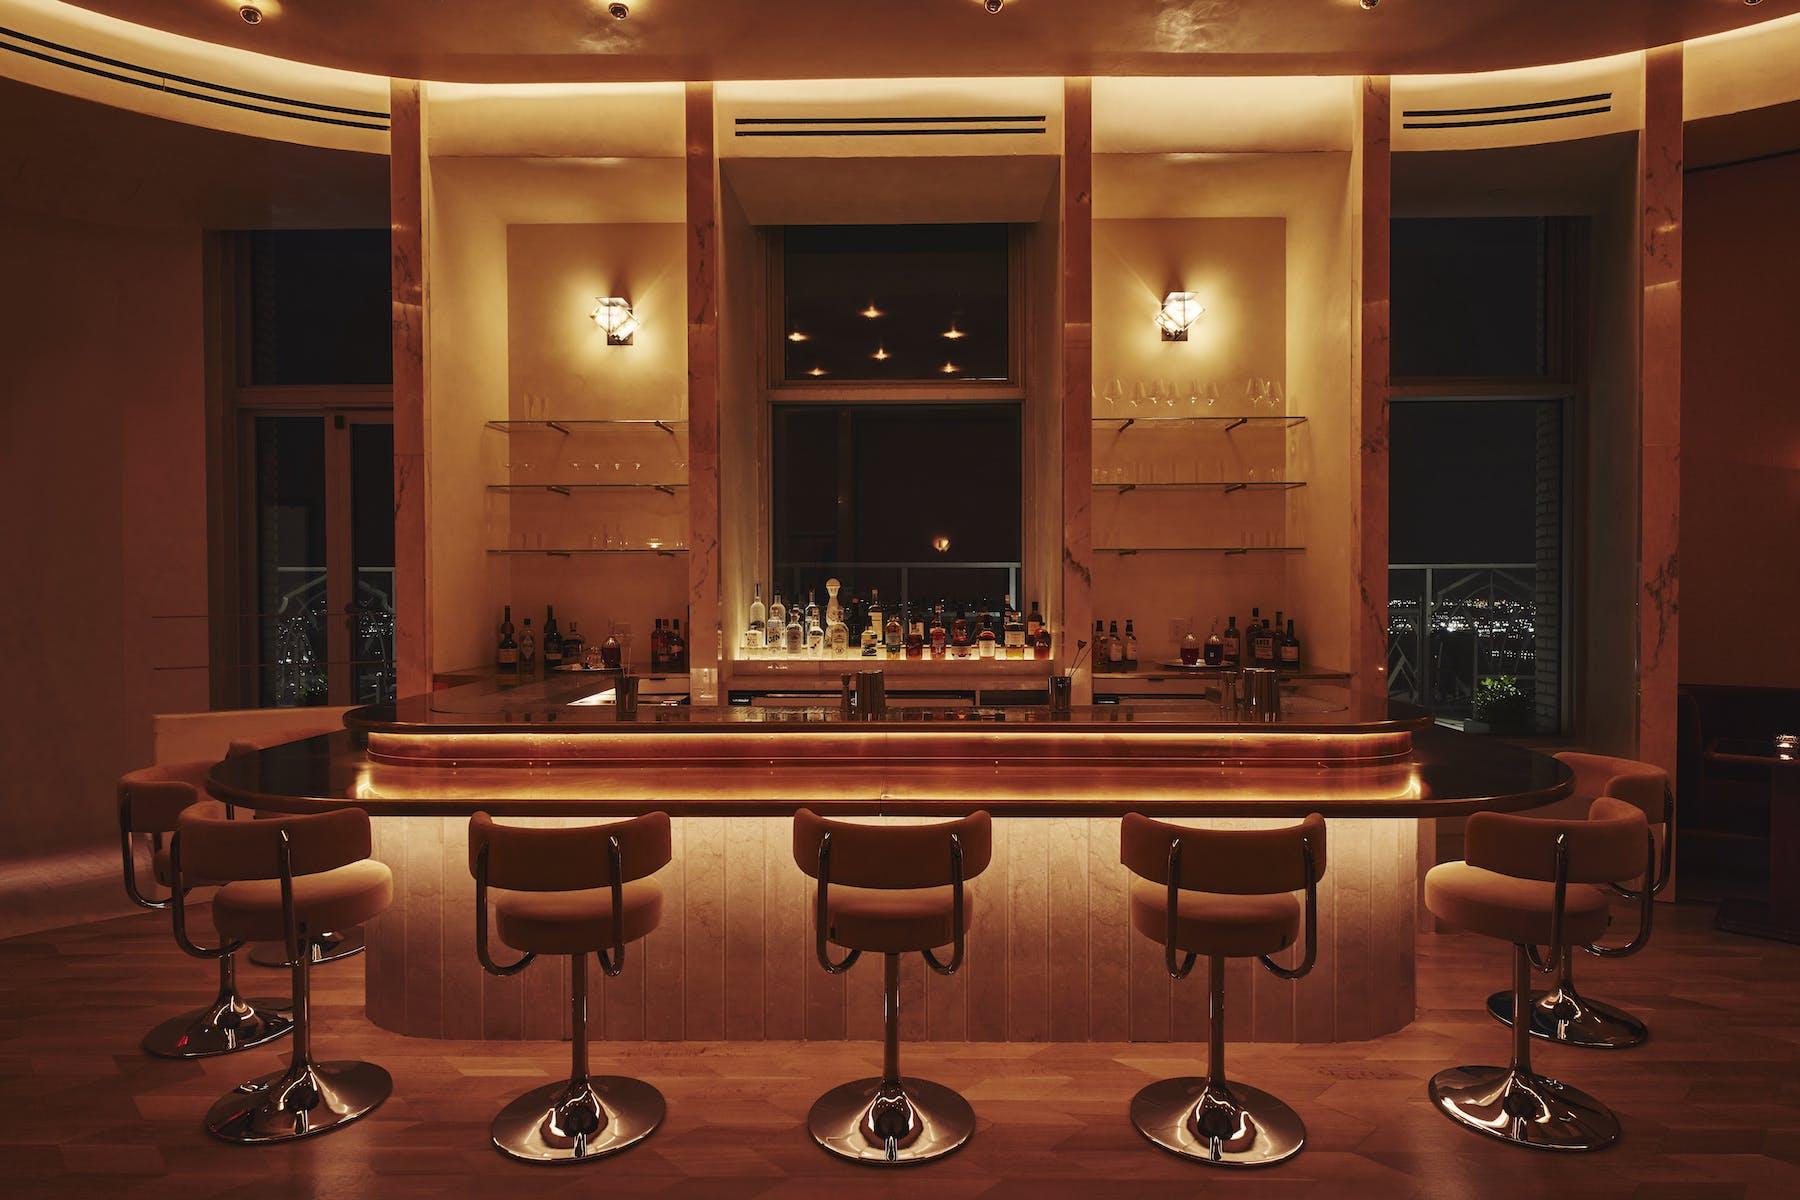 barroom with stool at night